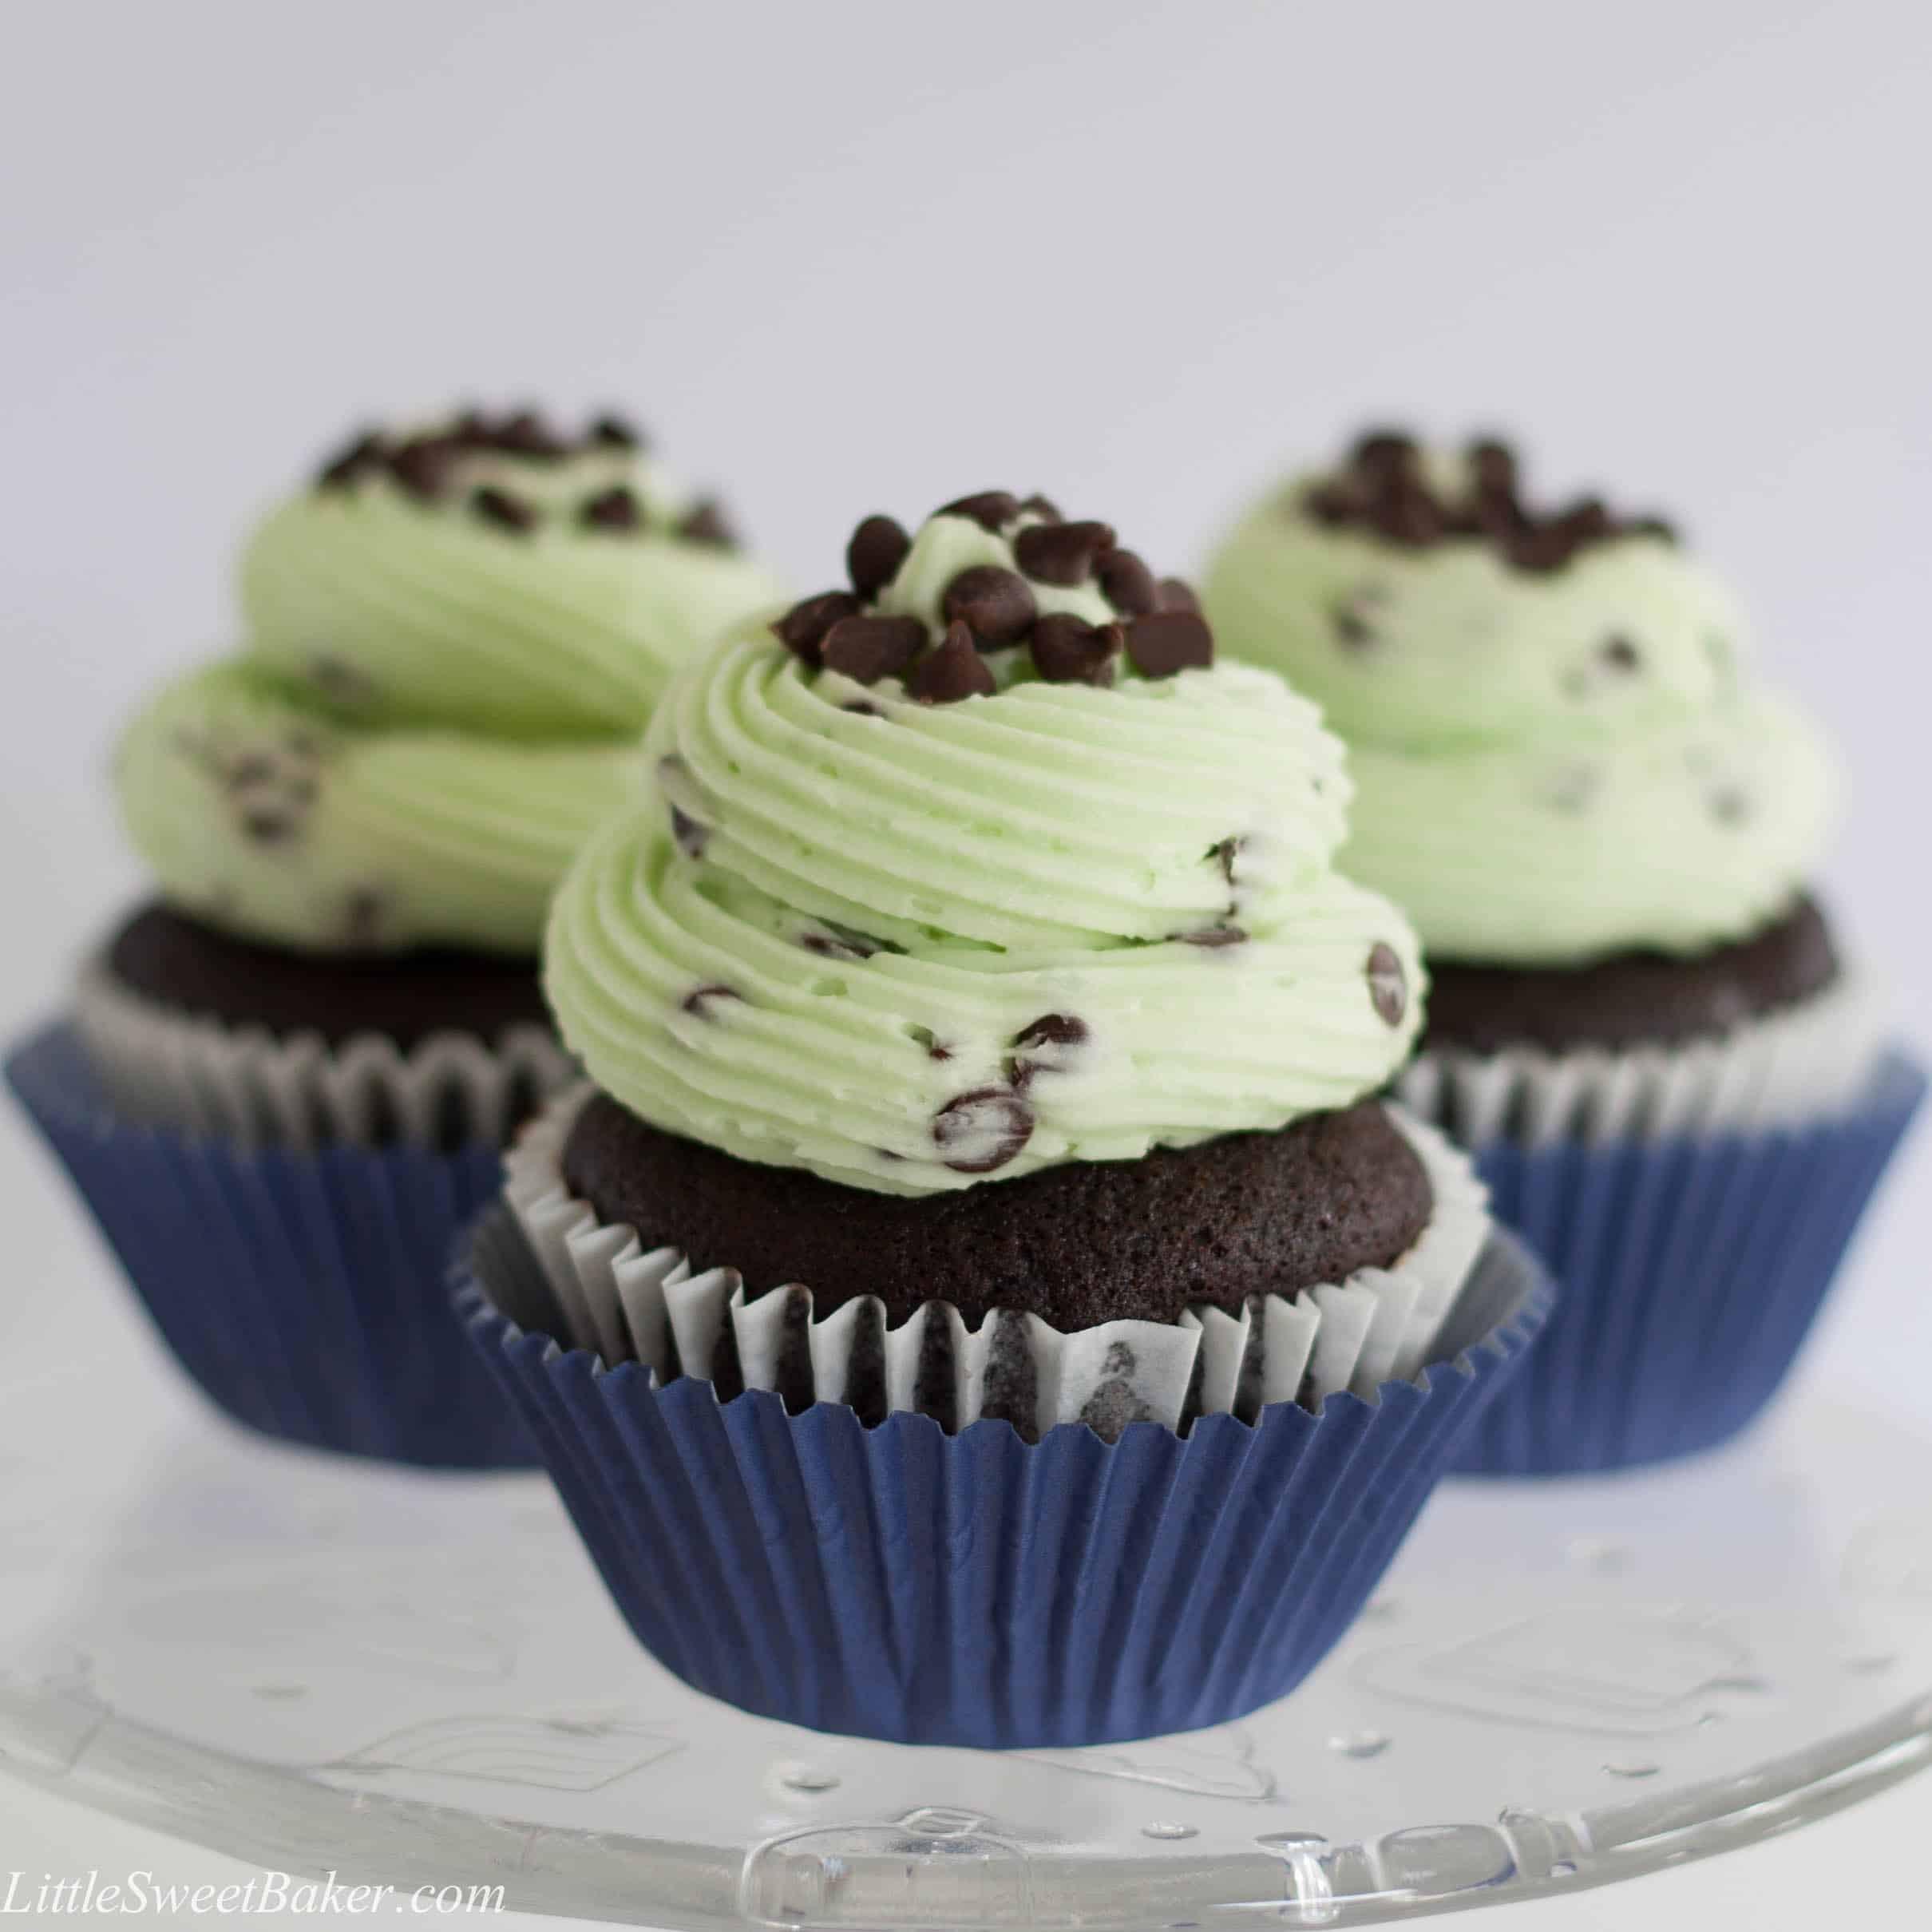 Chocolate Chip Cupcakes  Chocolate Mint Chocolate Chip Cupcakes